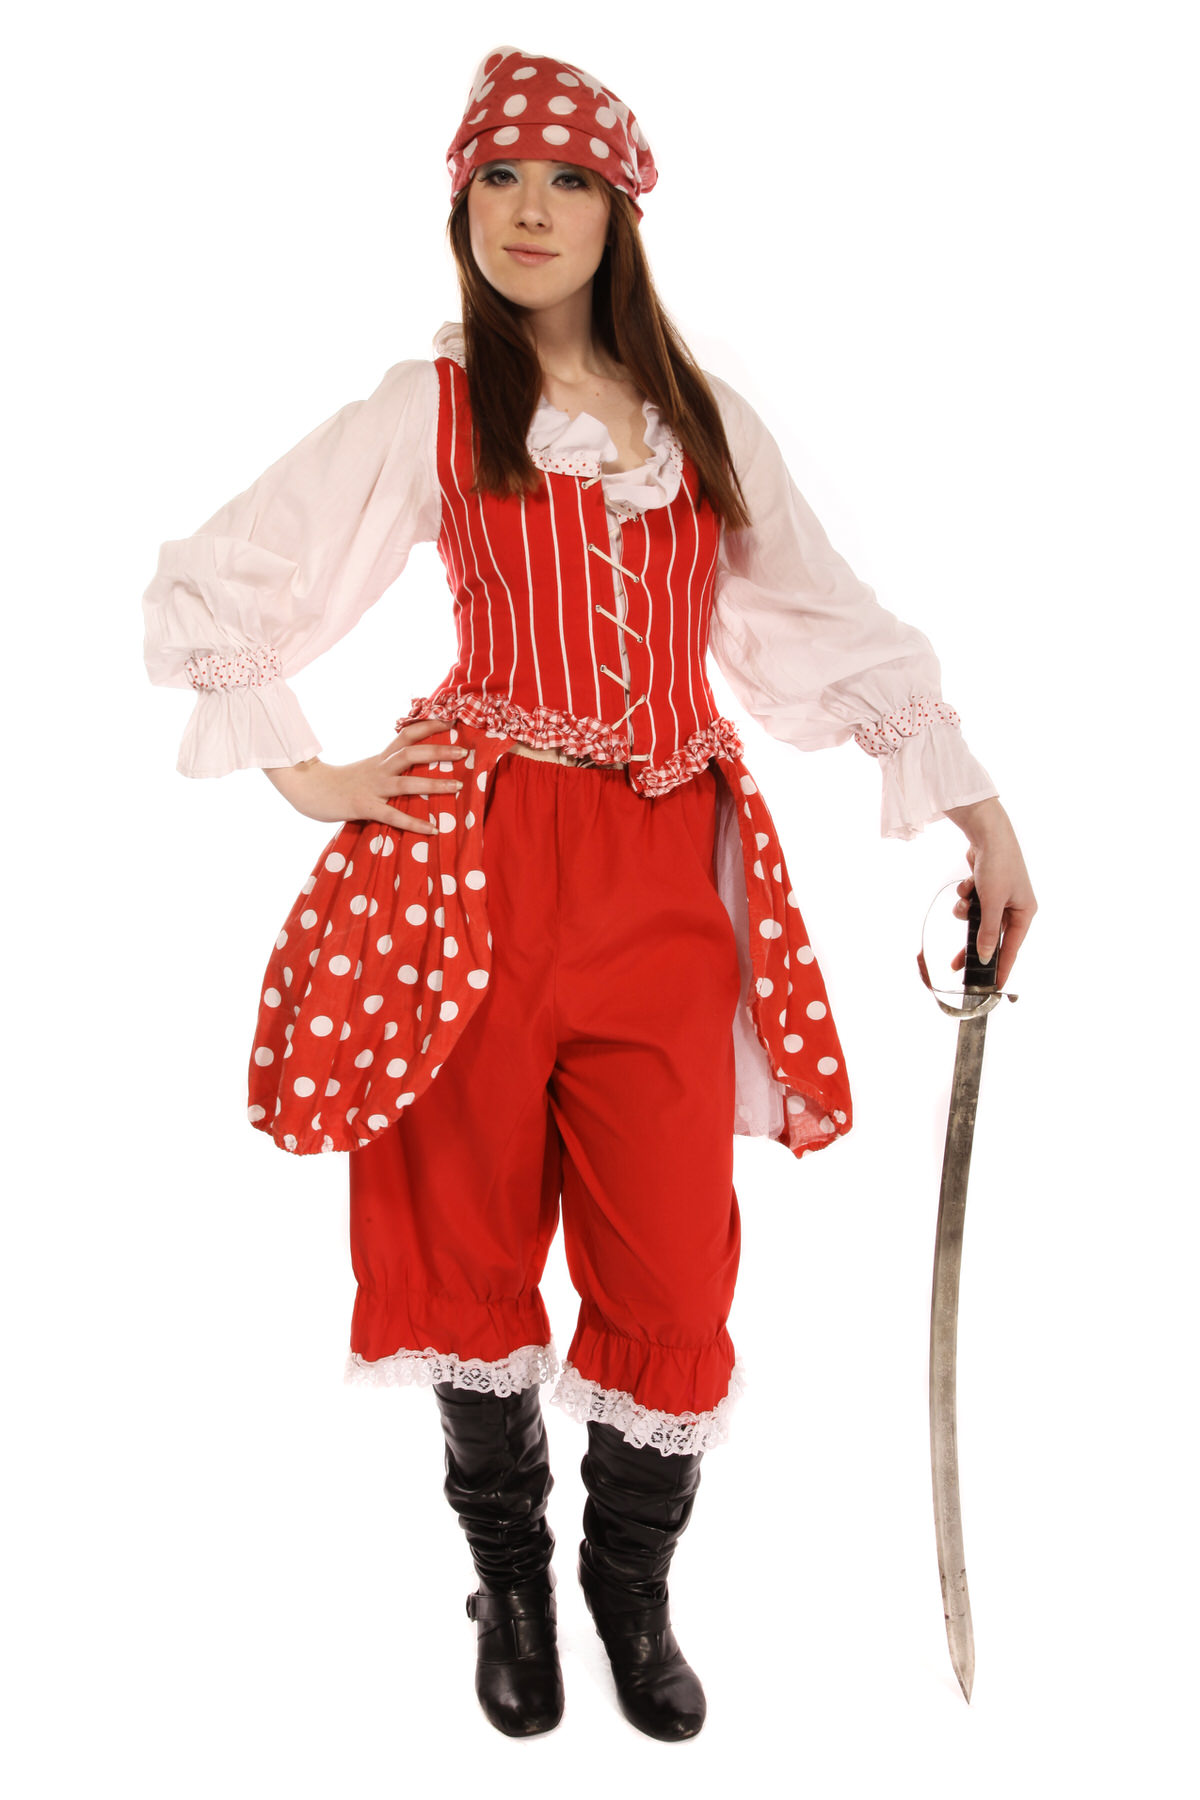 BUCCANEER GIRL RED POLKA DOT COSTUME